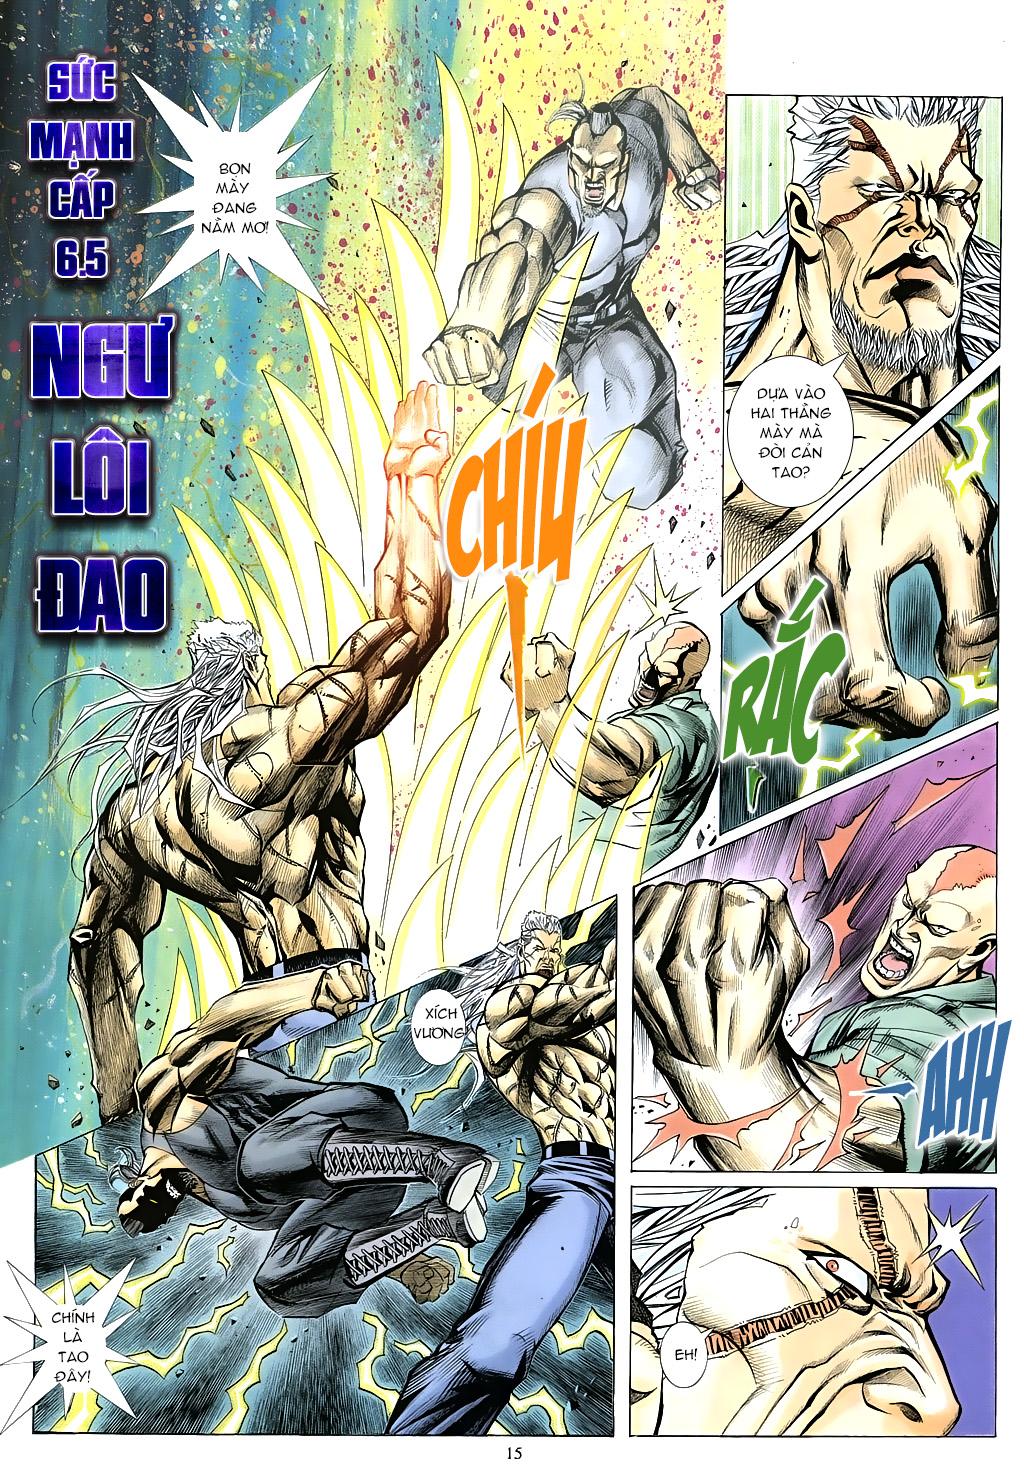 Mạt Nhật Chiến Lang Chap 59 - Next Chap 60 image 15